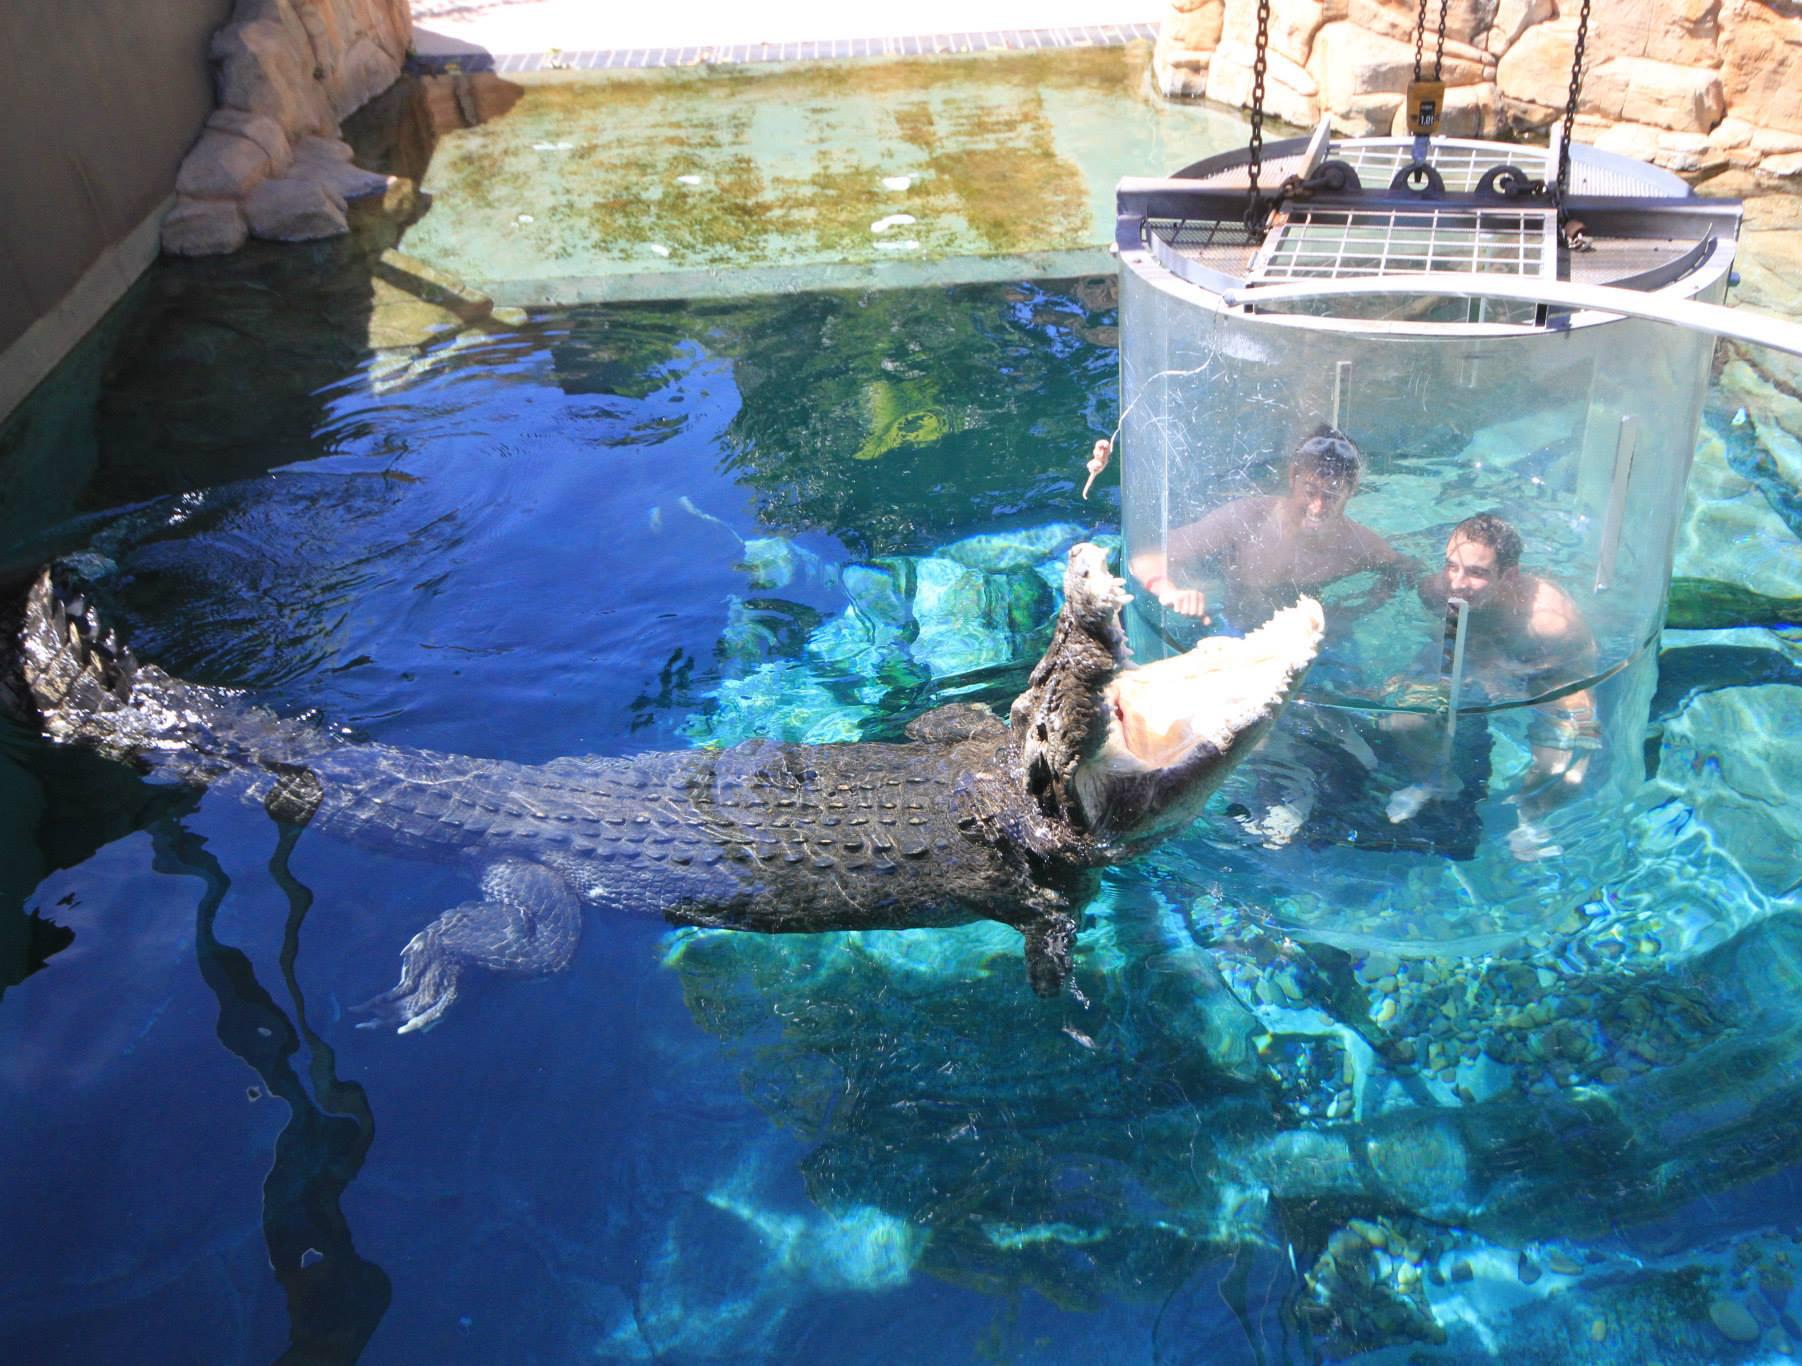 crocosaurus-cove--cage-of-death-07